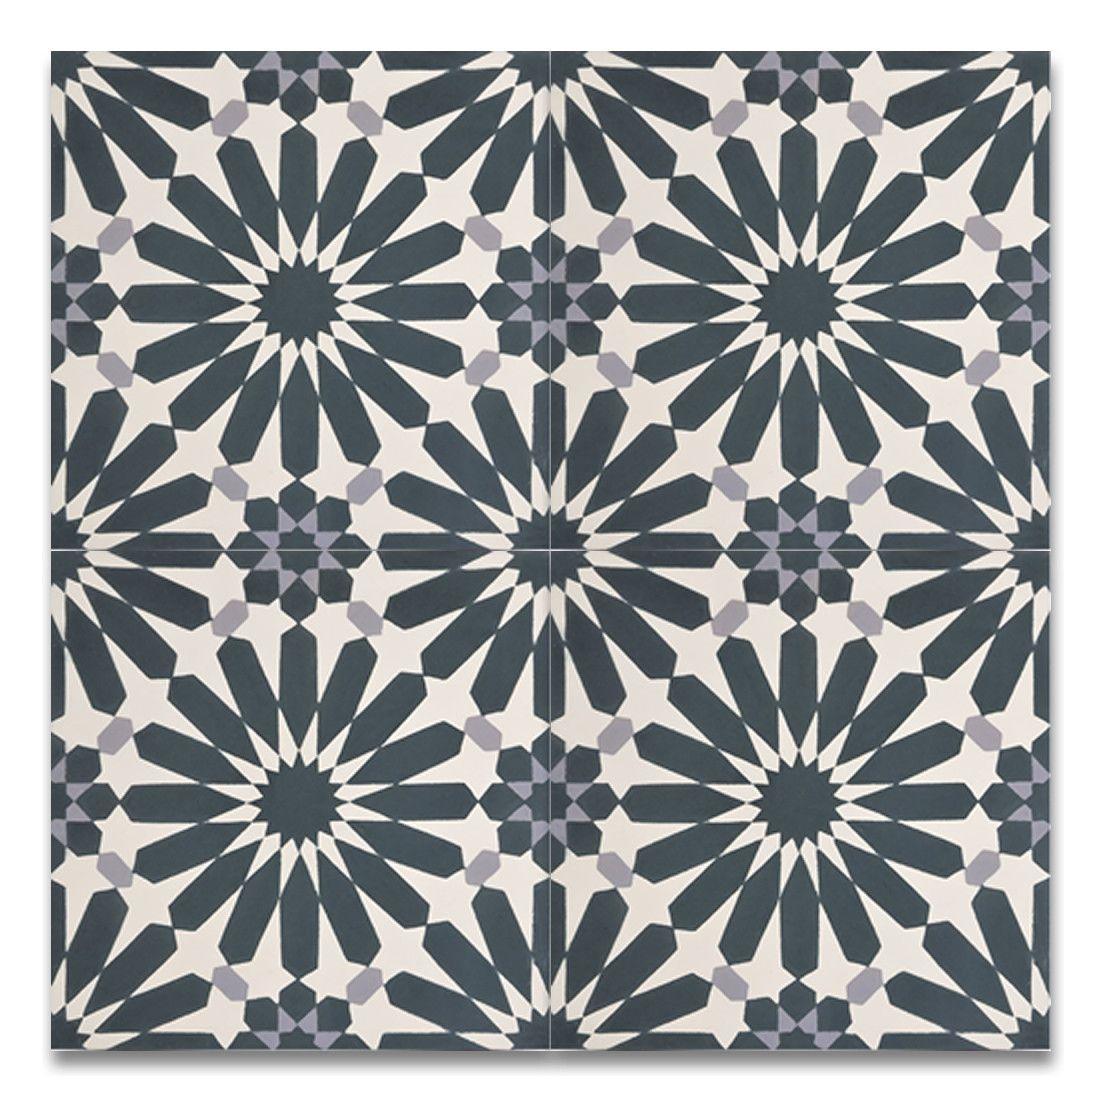 Alhambra Handmade 8 X 8 Cement Subway Tile In Navy Blue